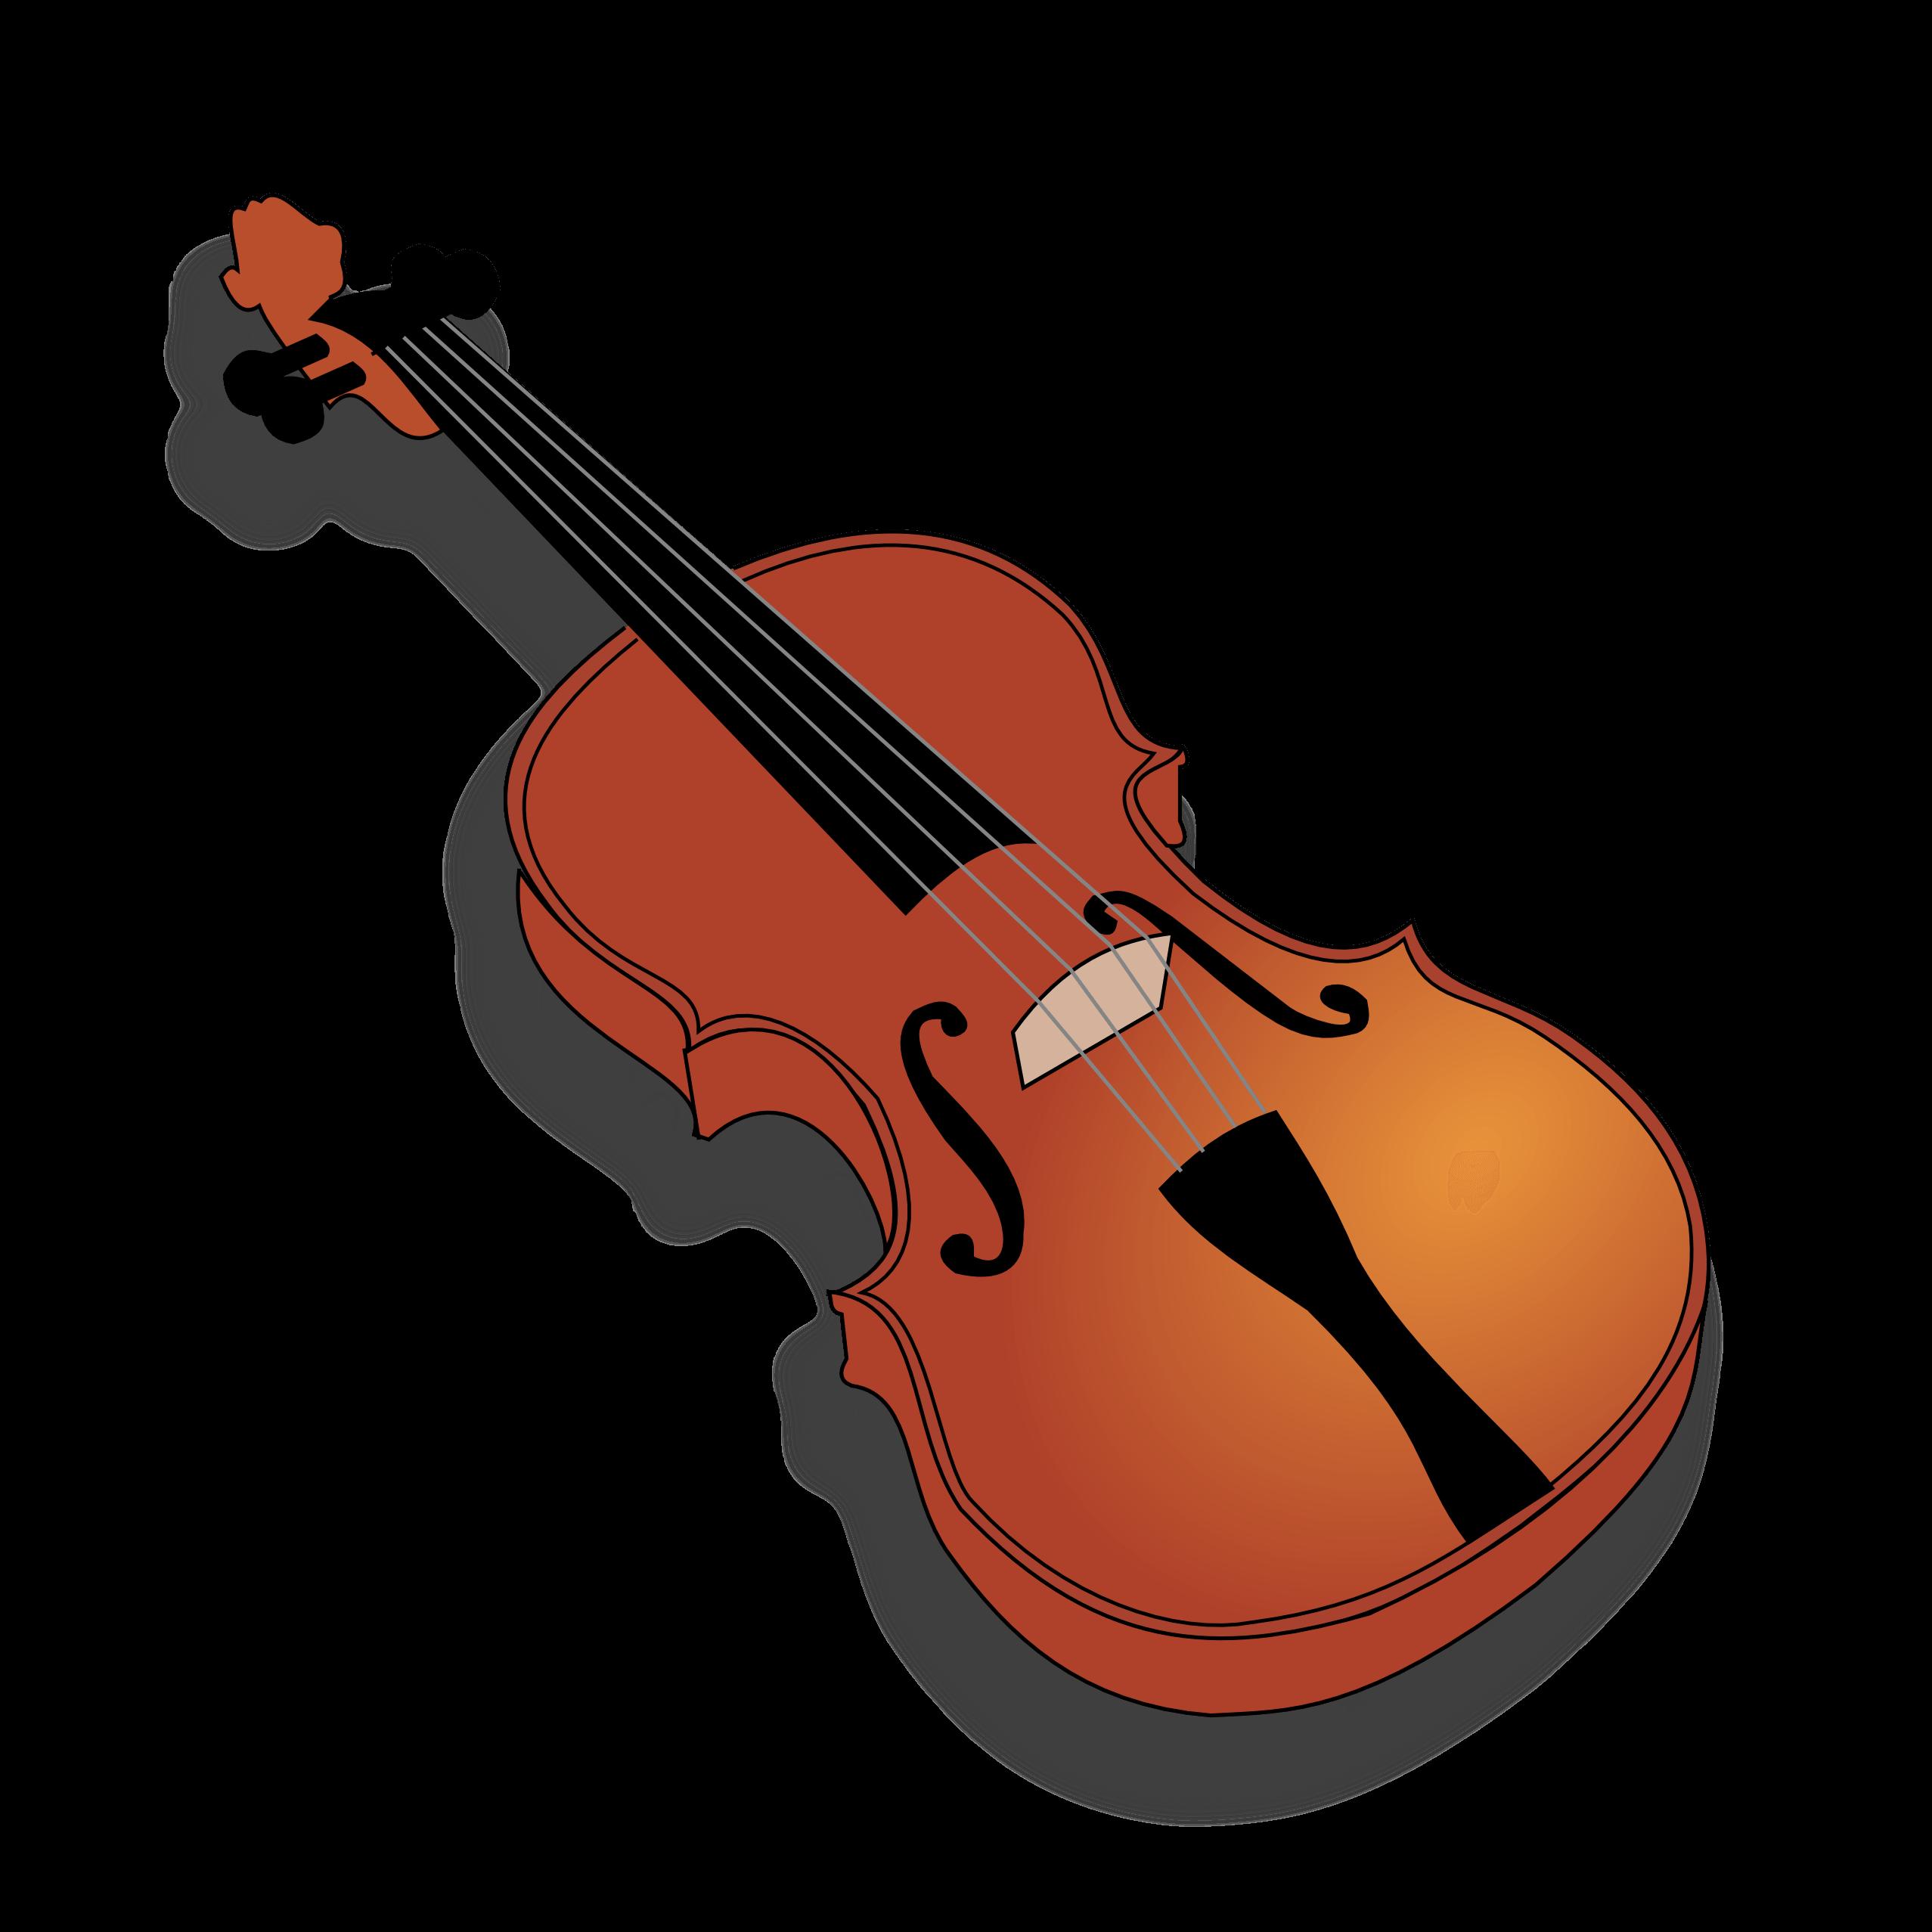 Cliparts zone . Instruments clipart viola